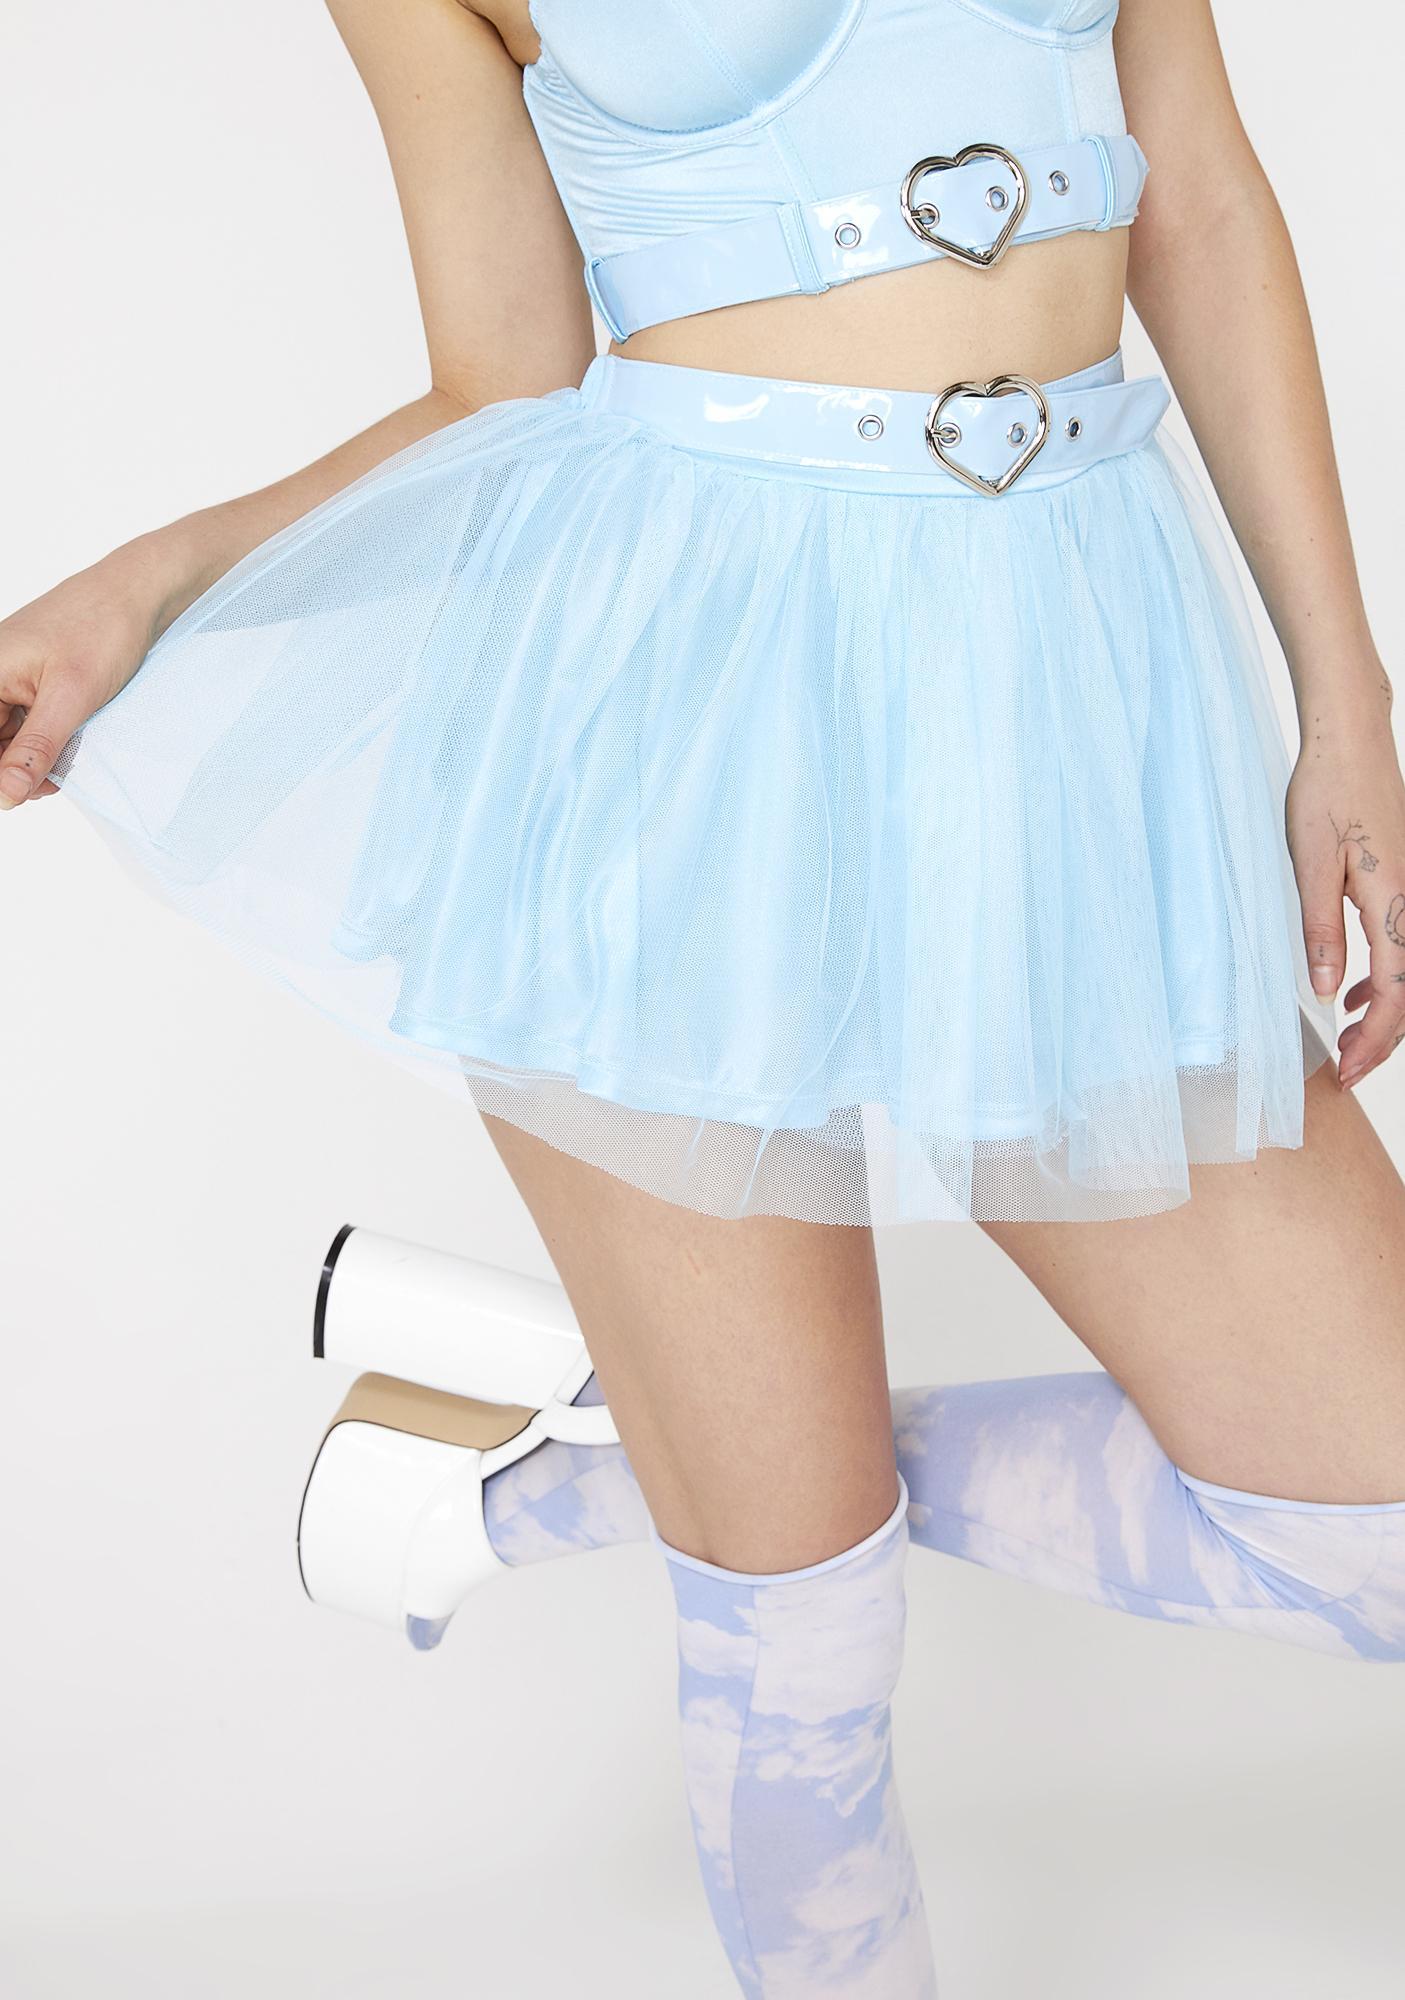 Sugar Thrillz Royally Praise Me Tutu Skirt